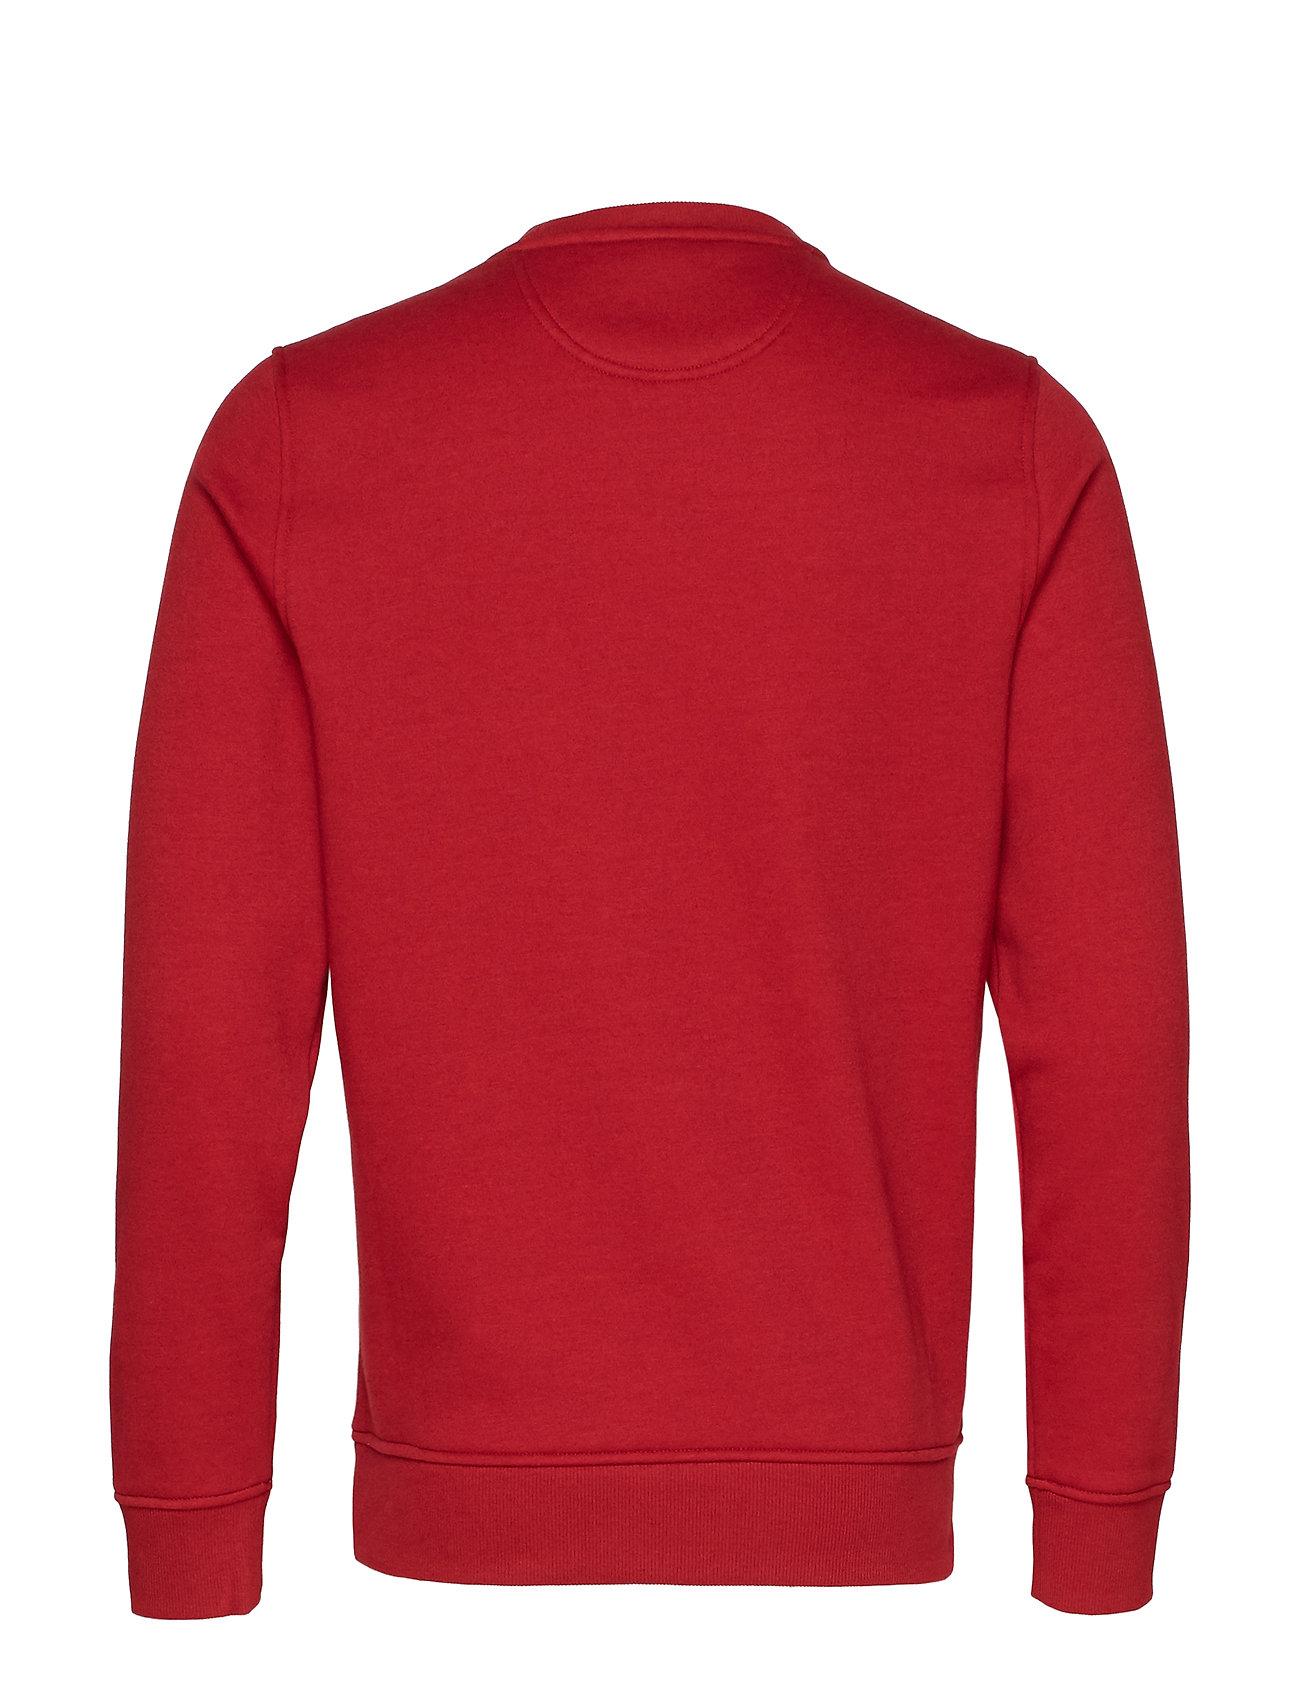 Fleece Red Crewbiking Izod Applique 4c3q5ARjL